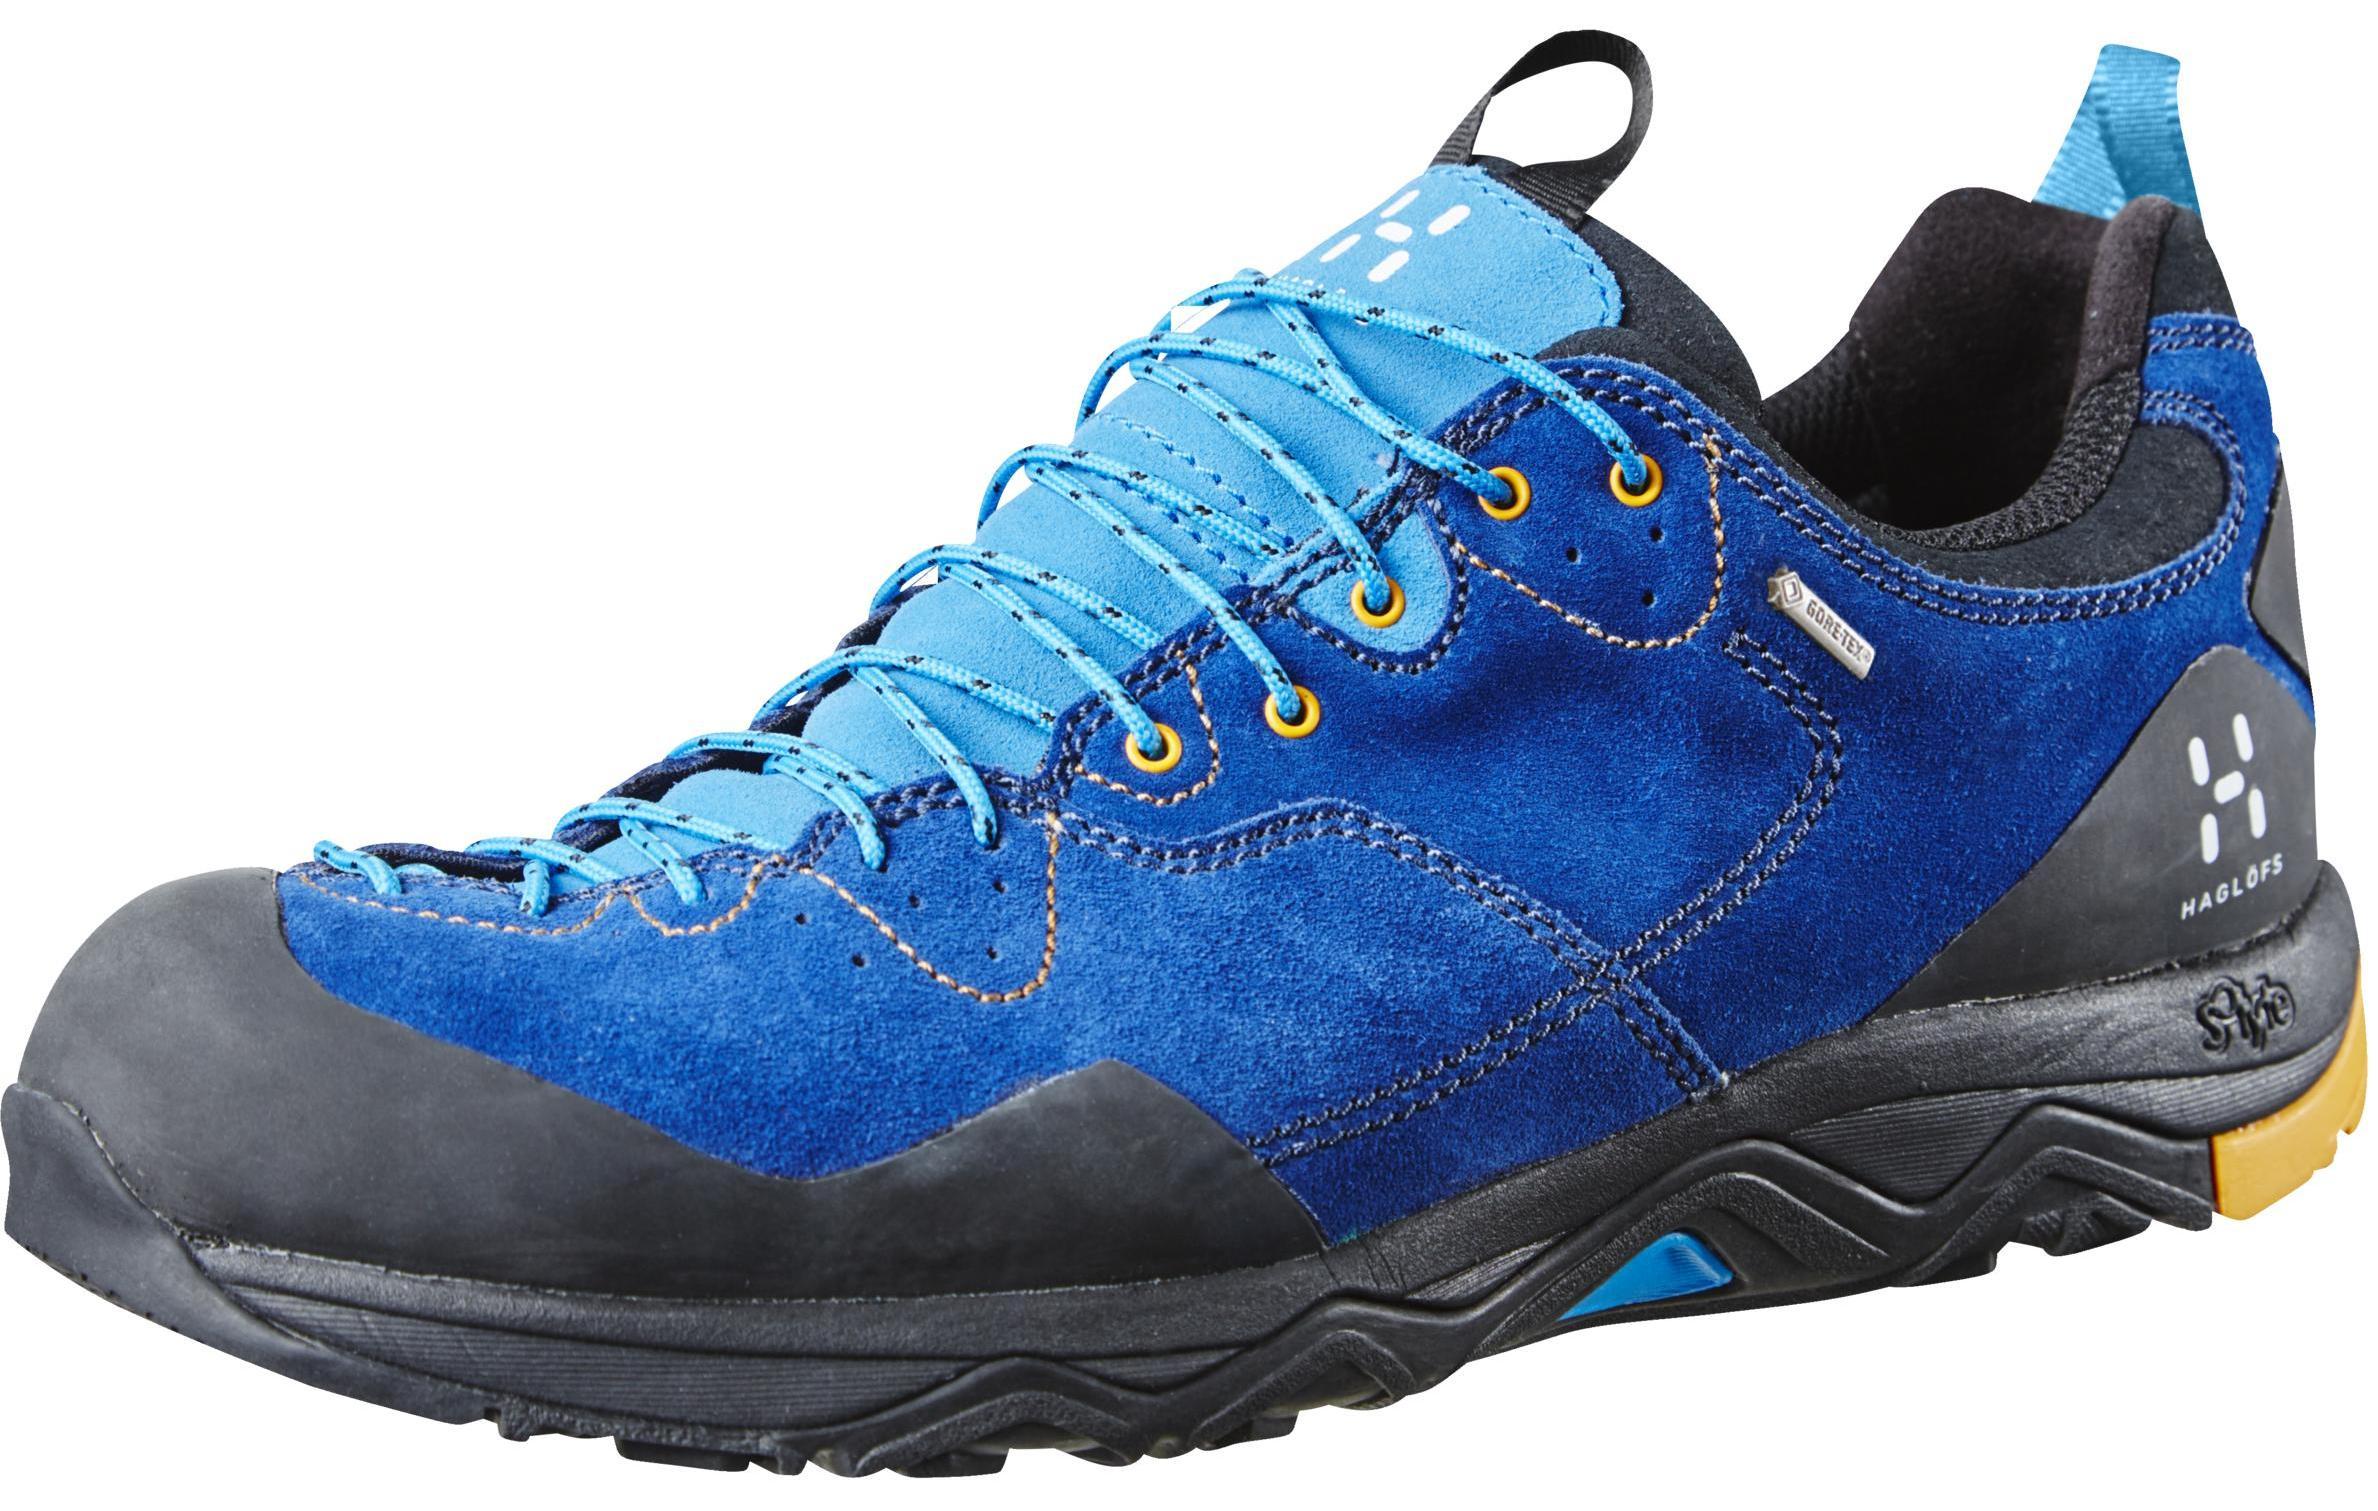 HAGLOFS 休閒鞋/登山鞋/防水健行鞋Rocker Leather GT 瑞典 男款Gore-tex鞋 491660-33Q 颶風藍/番花黃